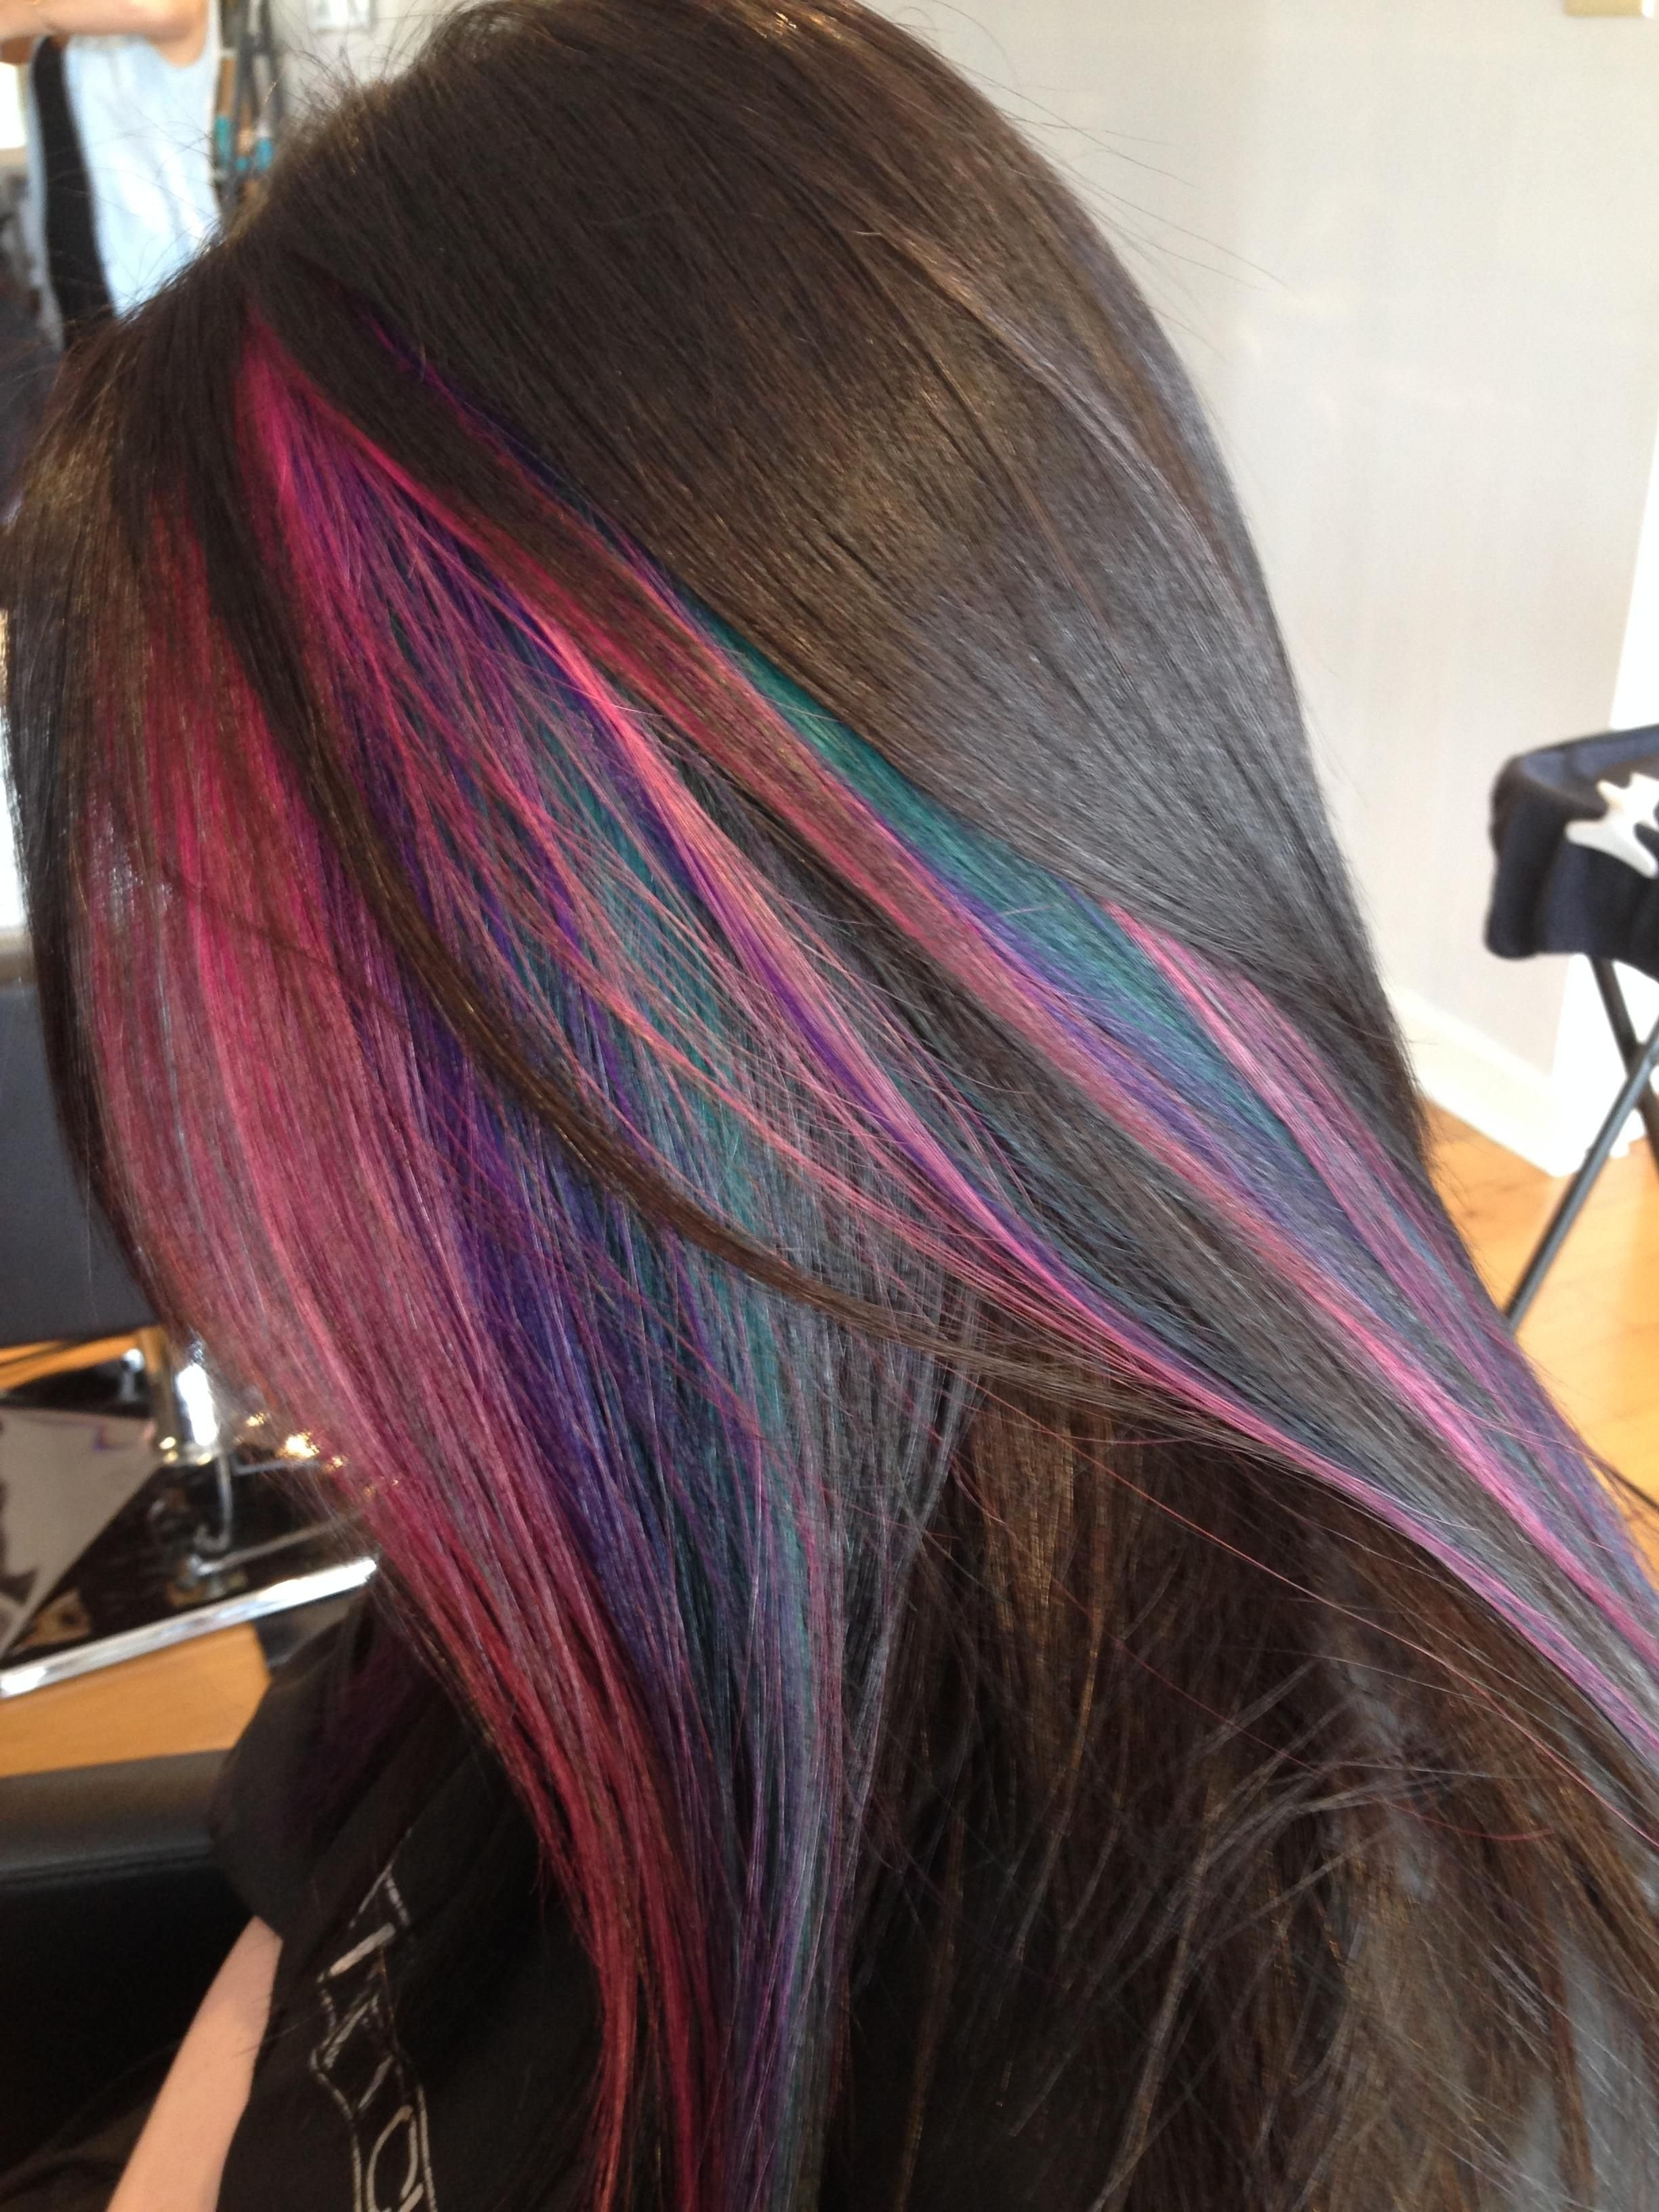 40 Ideas Of Peek A Boo Highlights For Any Hair Color Cool Hair